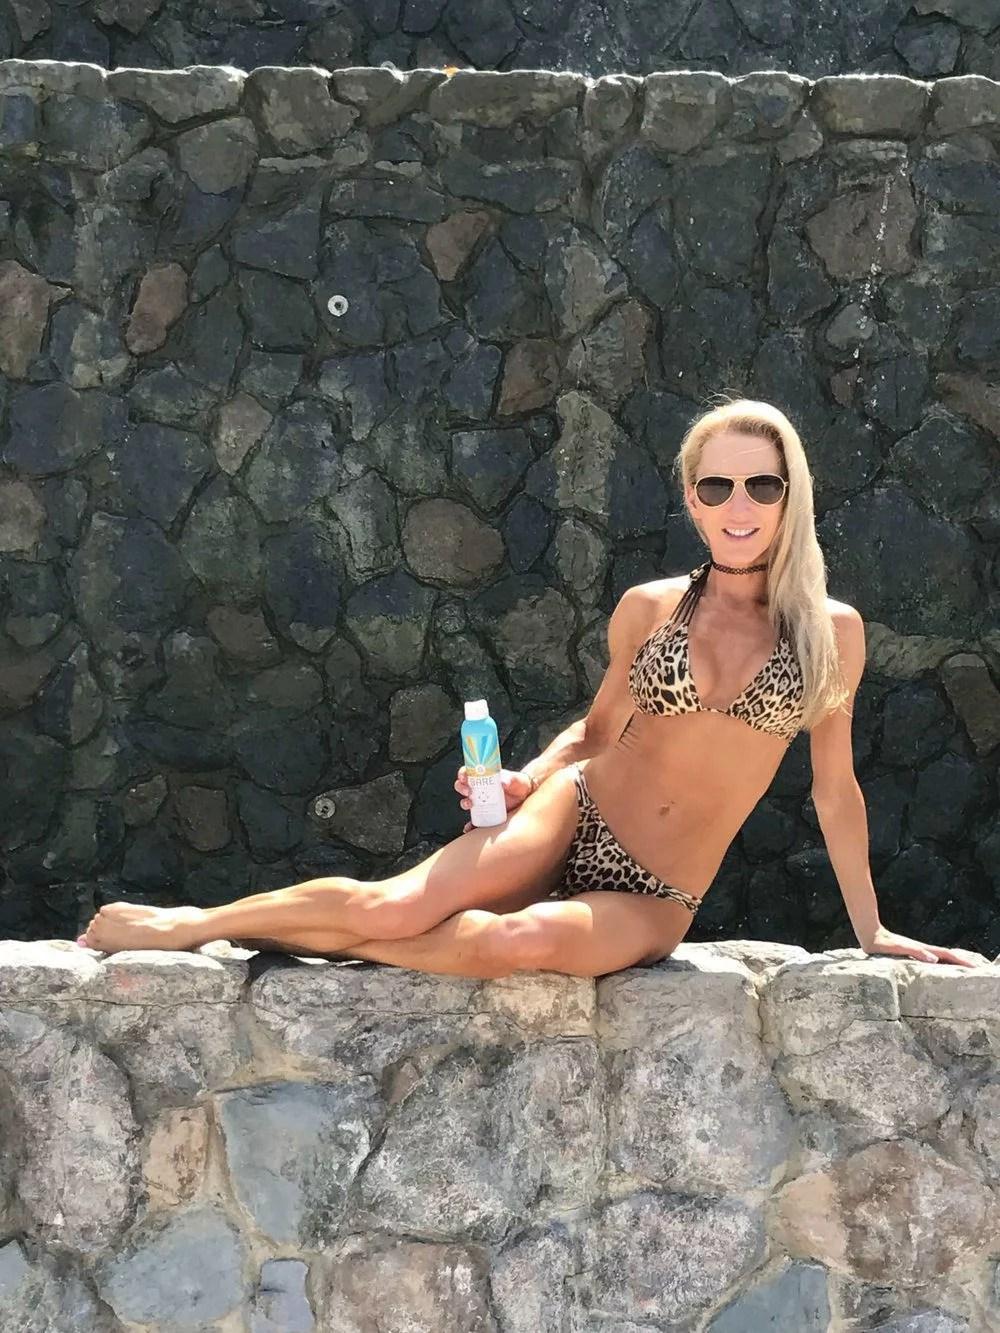 Best cruelty-free sunscreen Bare Republic Clearscreen® SPF 50 Sport Sunscreen Spray bikini model St Thomas.